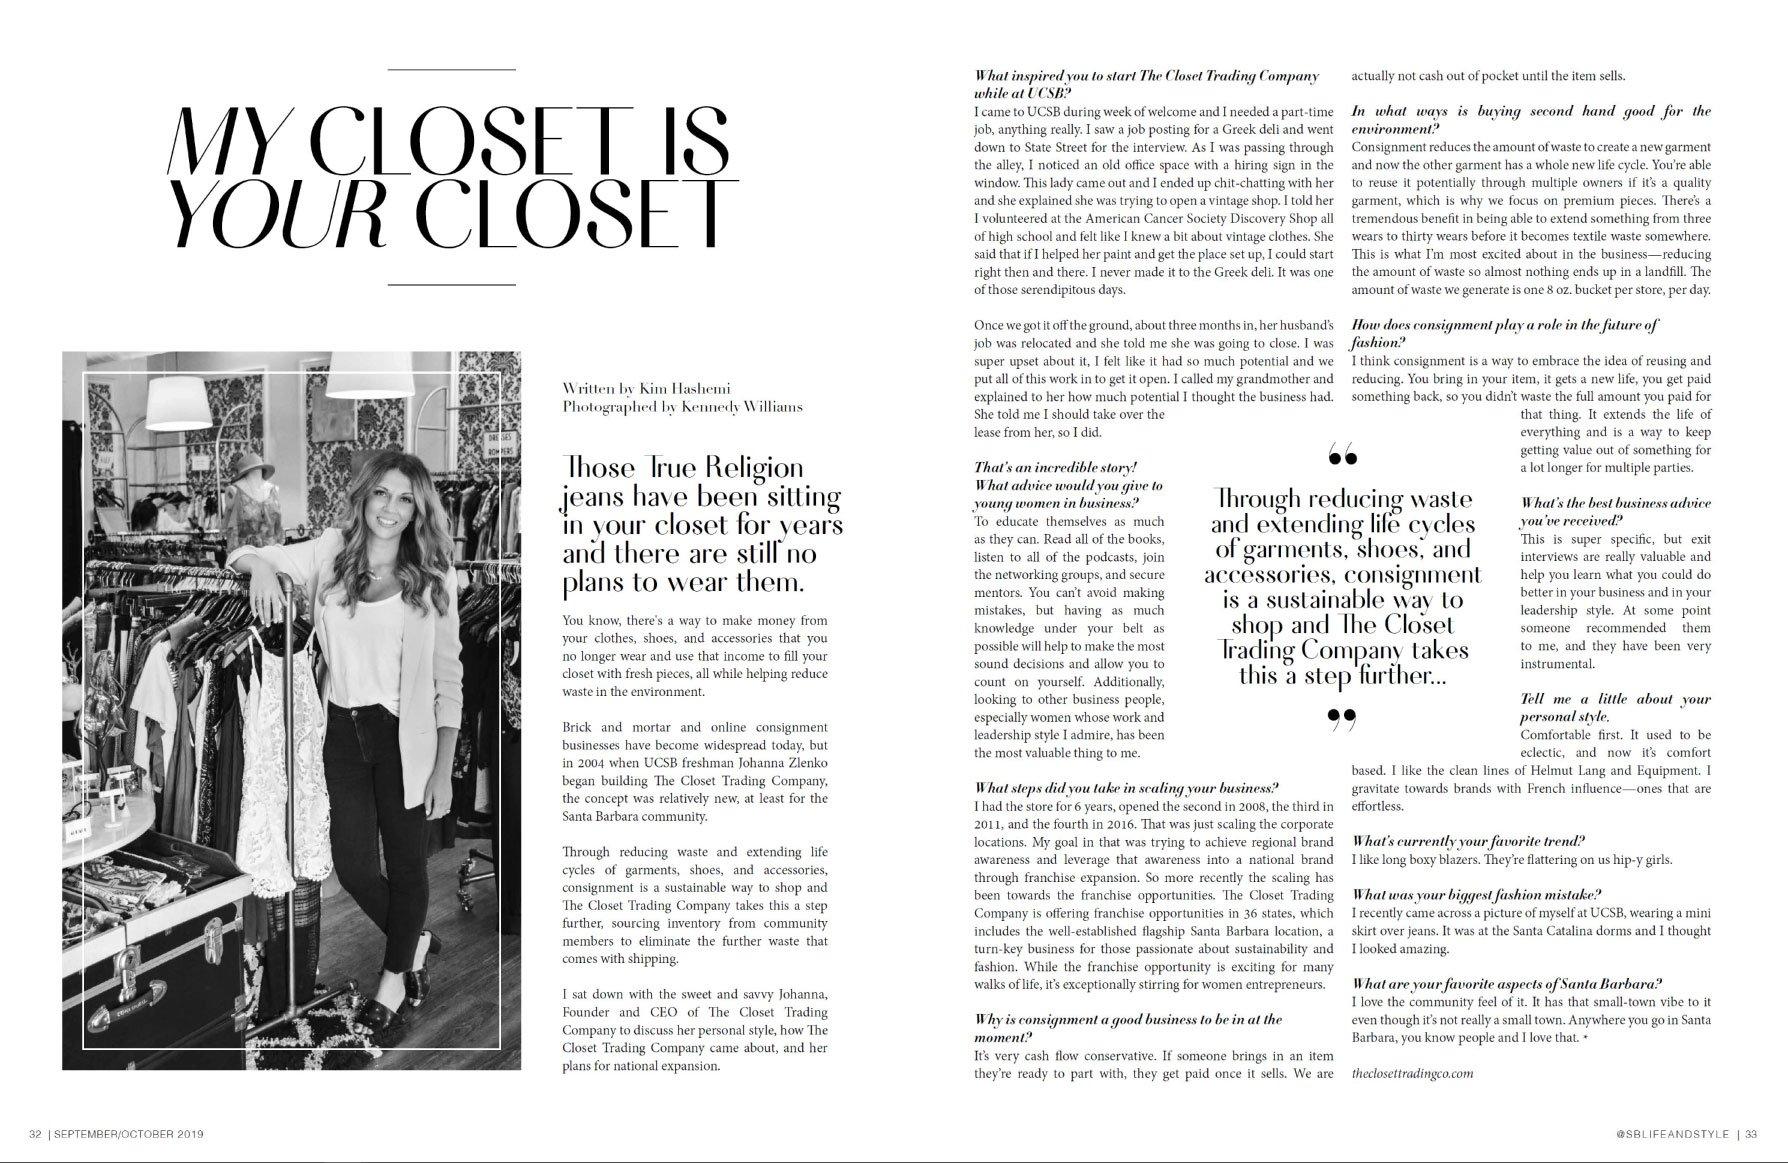 Santa Barbara Life and Style Magazine - by Kim Hashemi